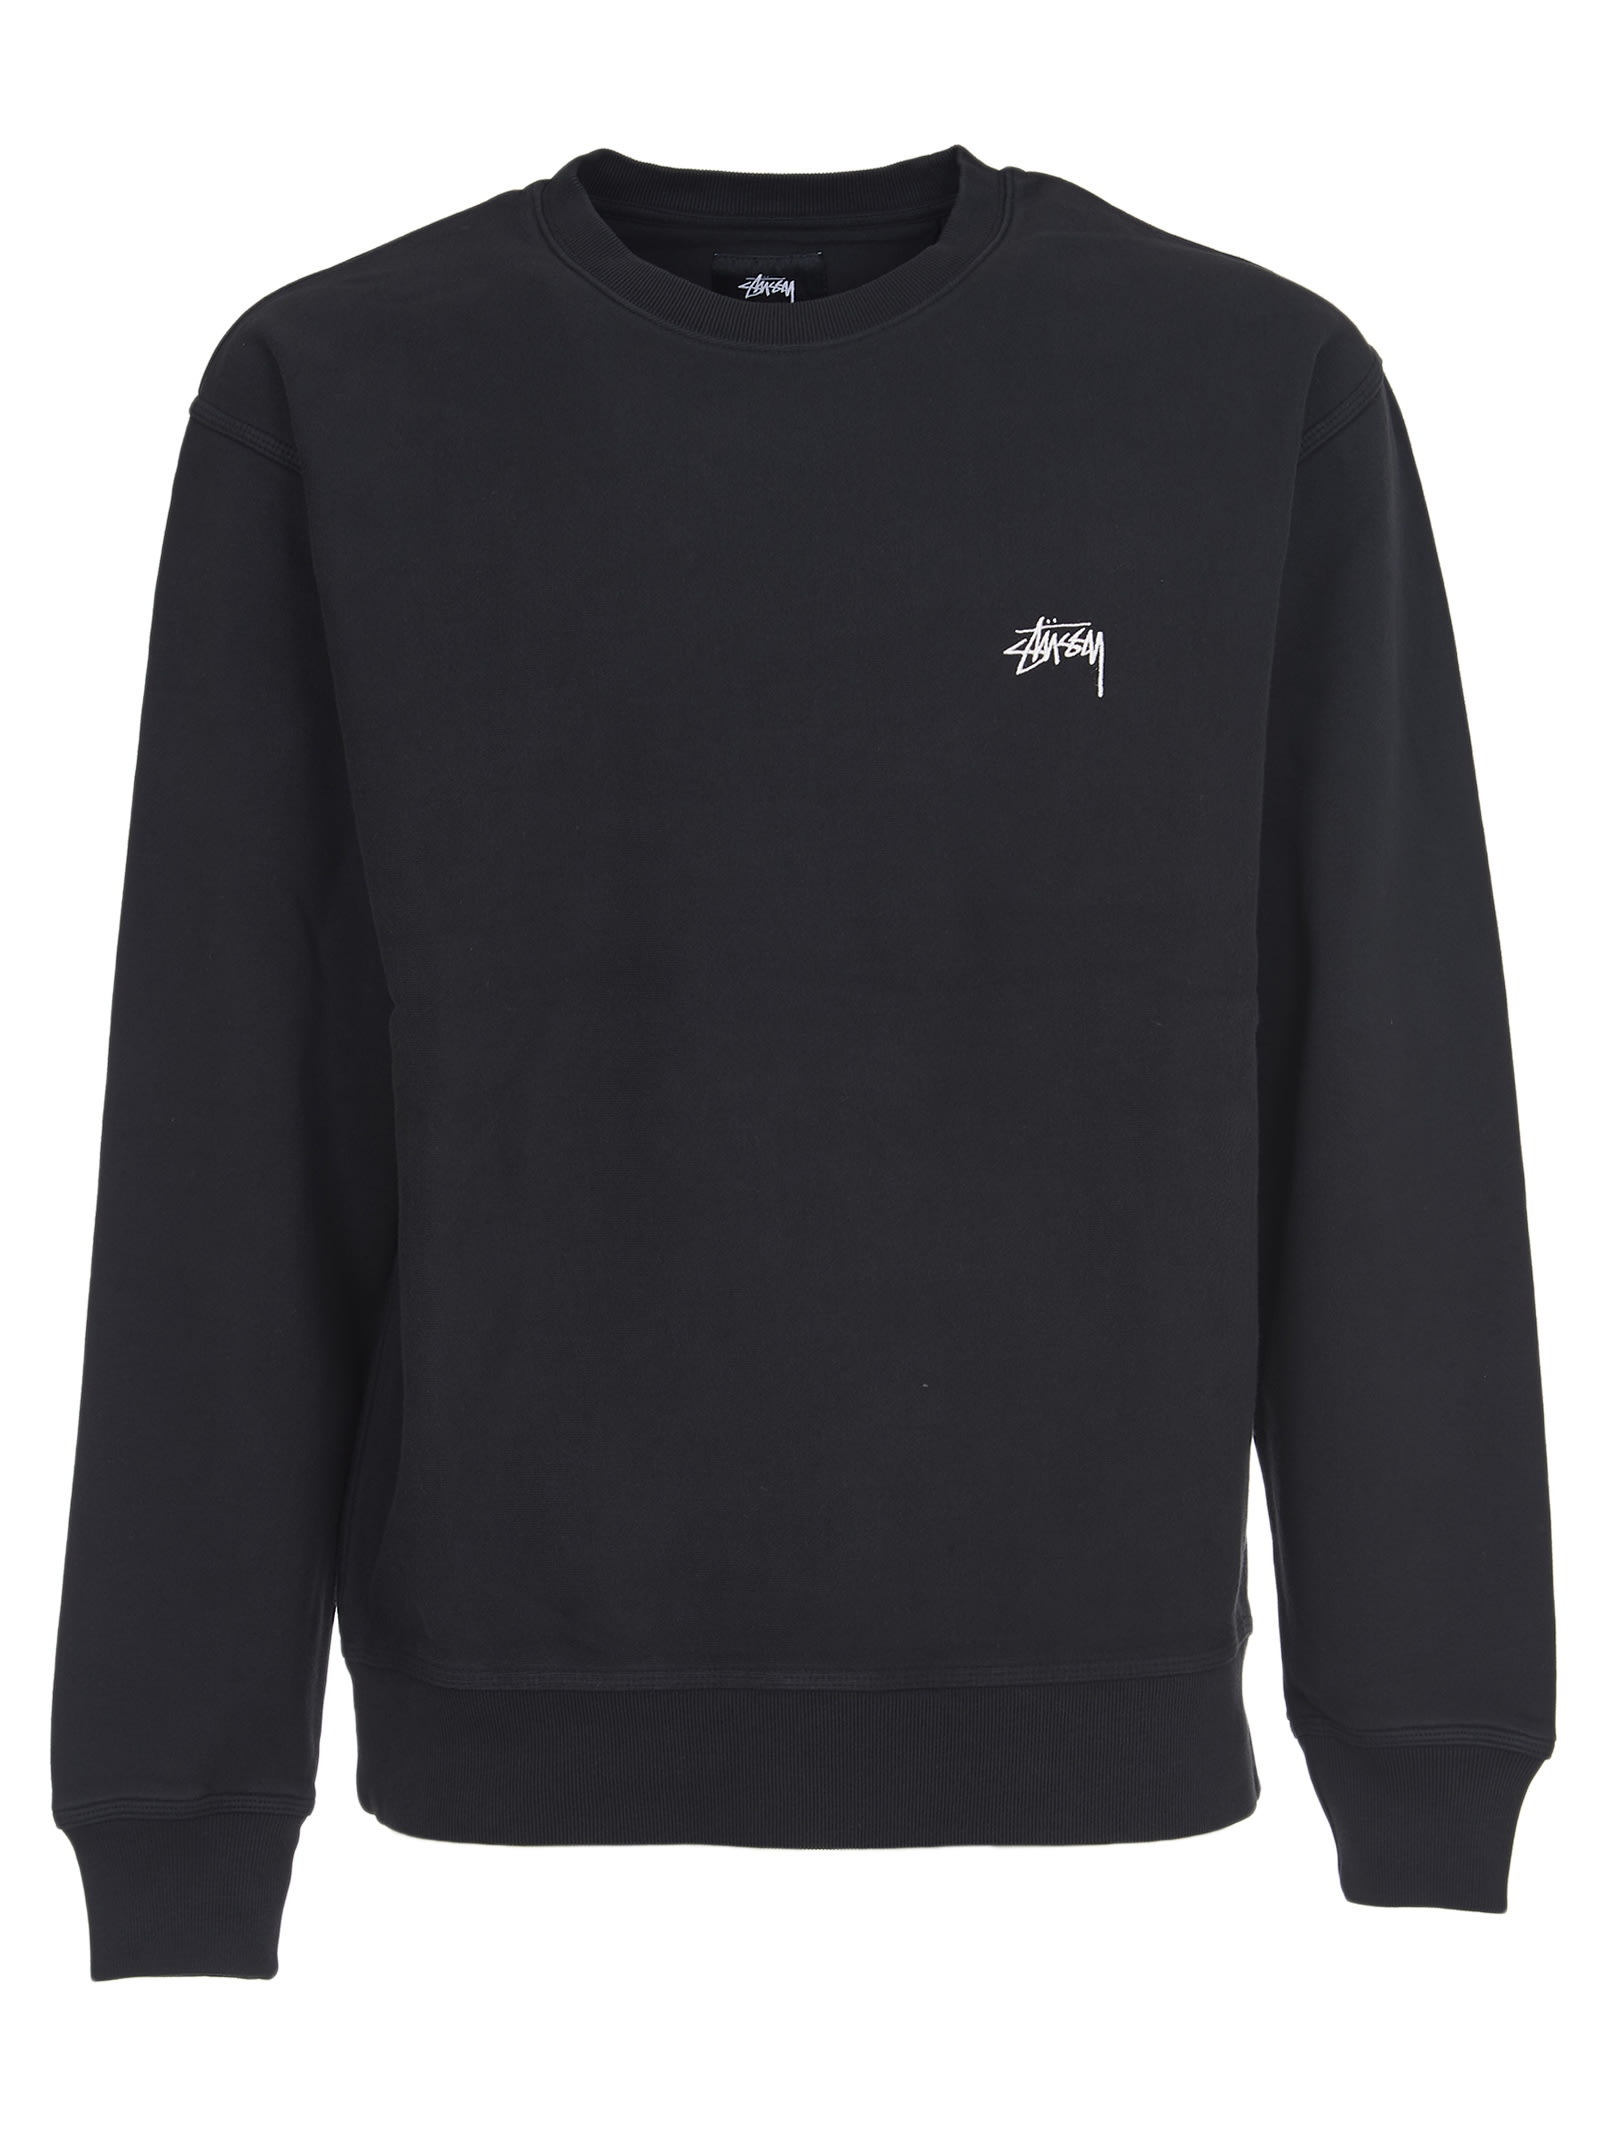 Stussy Black Basic Sweatshirt